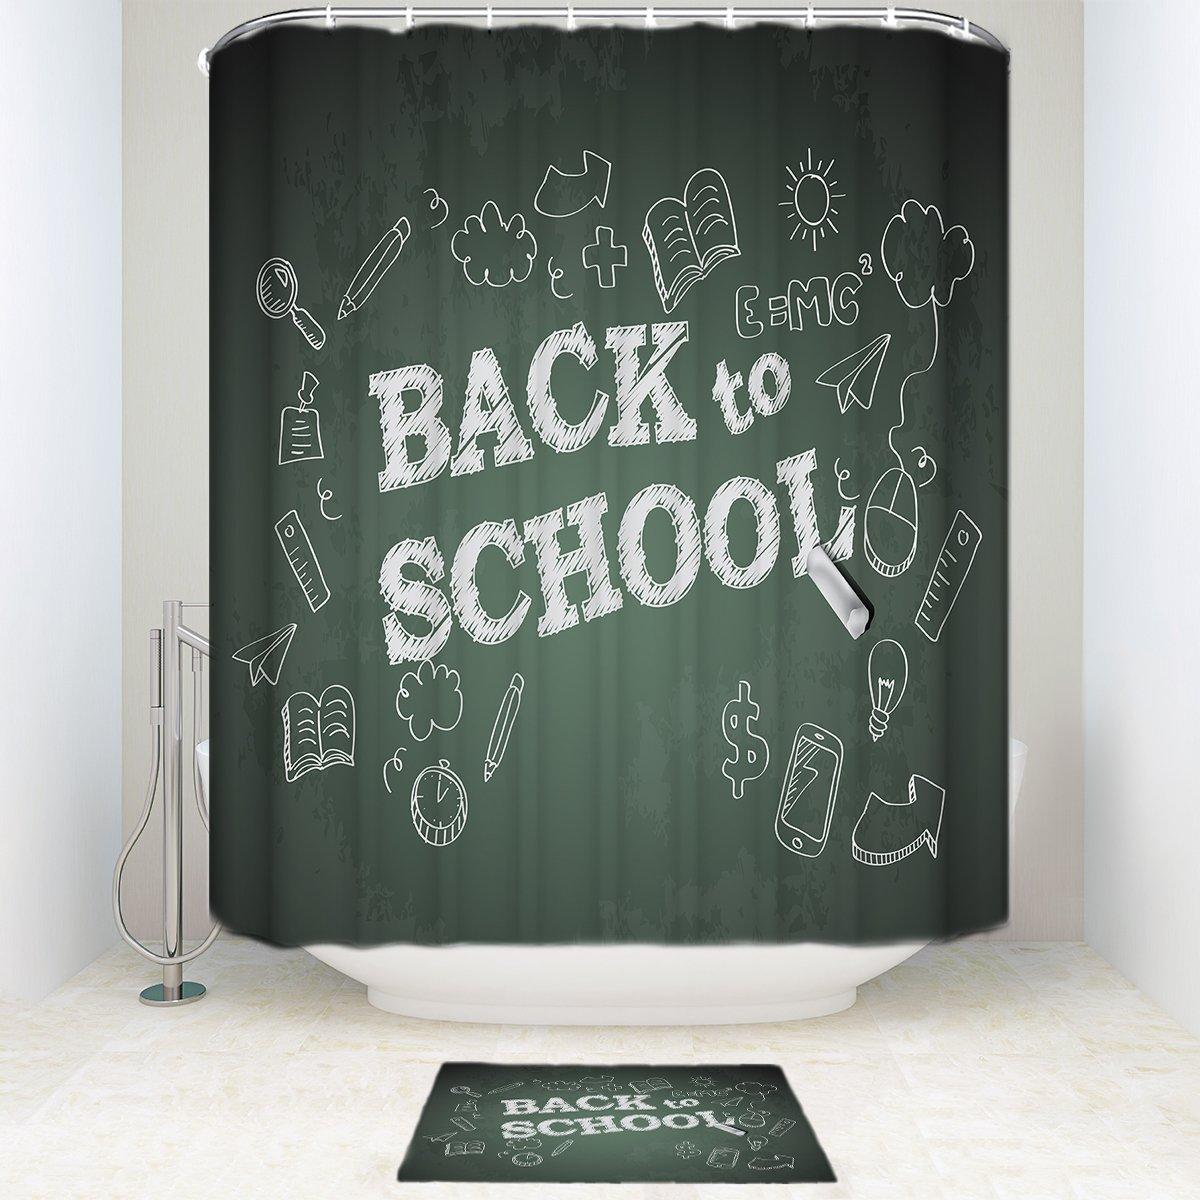 EZON-CH Waterproof Modern Good Mildew Resistance Back School Day Blackboard Polyester Farbic Bathroom Shower Set Shower Curatin With Doormat Rugs(Shower Curtain36x72in)